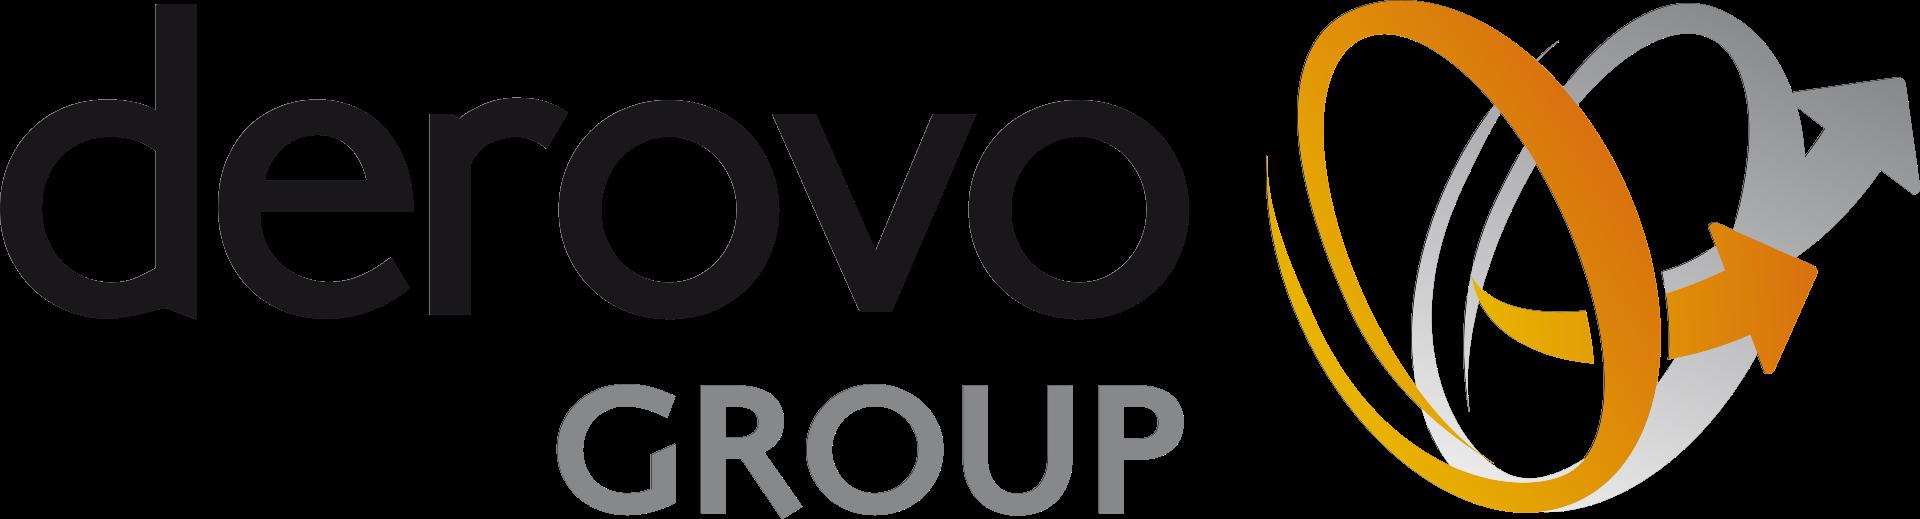 Derovo Group - Derivados de Ovos, S.A..png